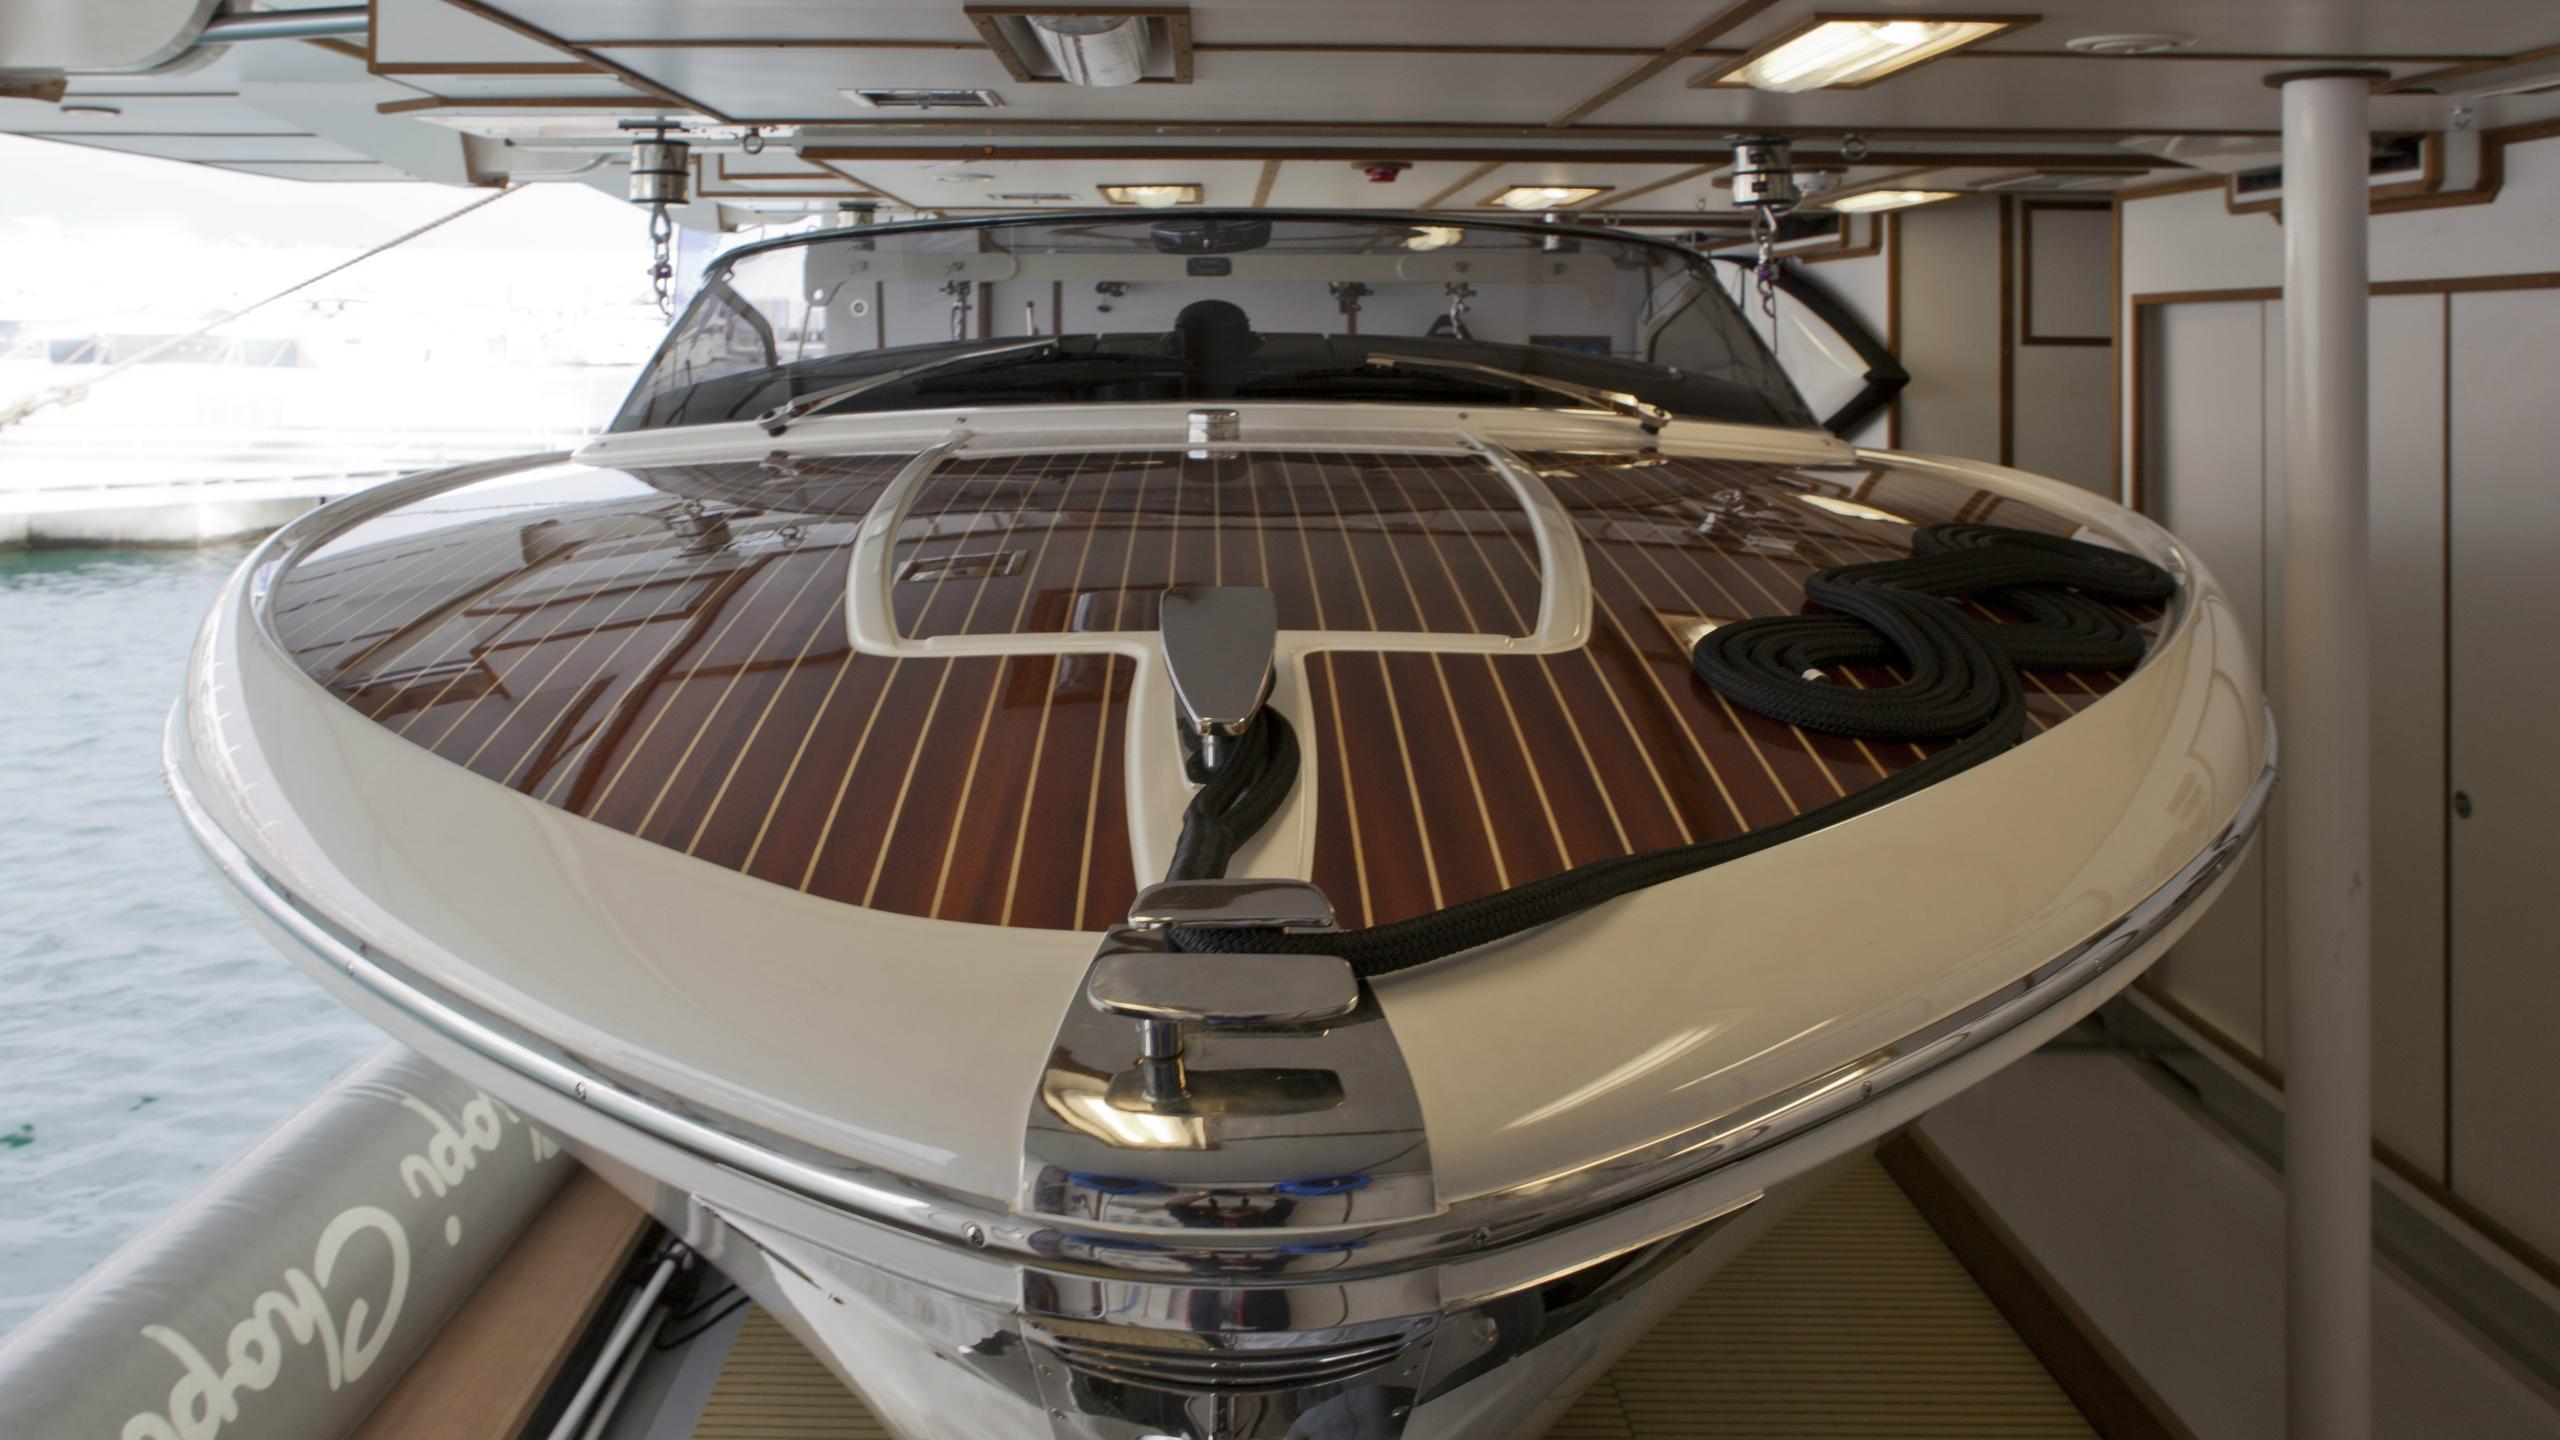 chopi-chopi-motor-yacht-crn-2013-80m-garage-guest-tender